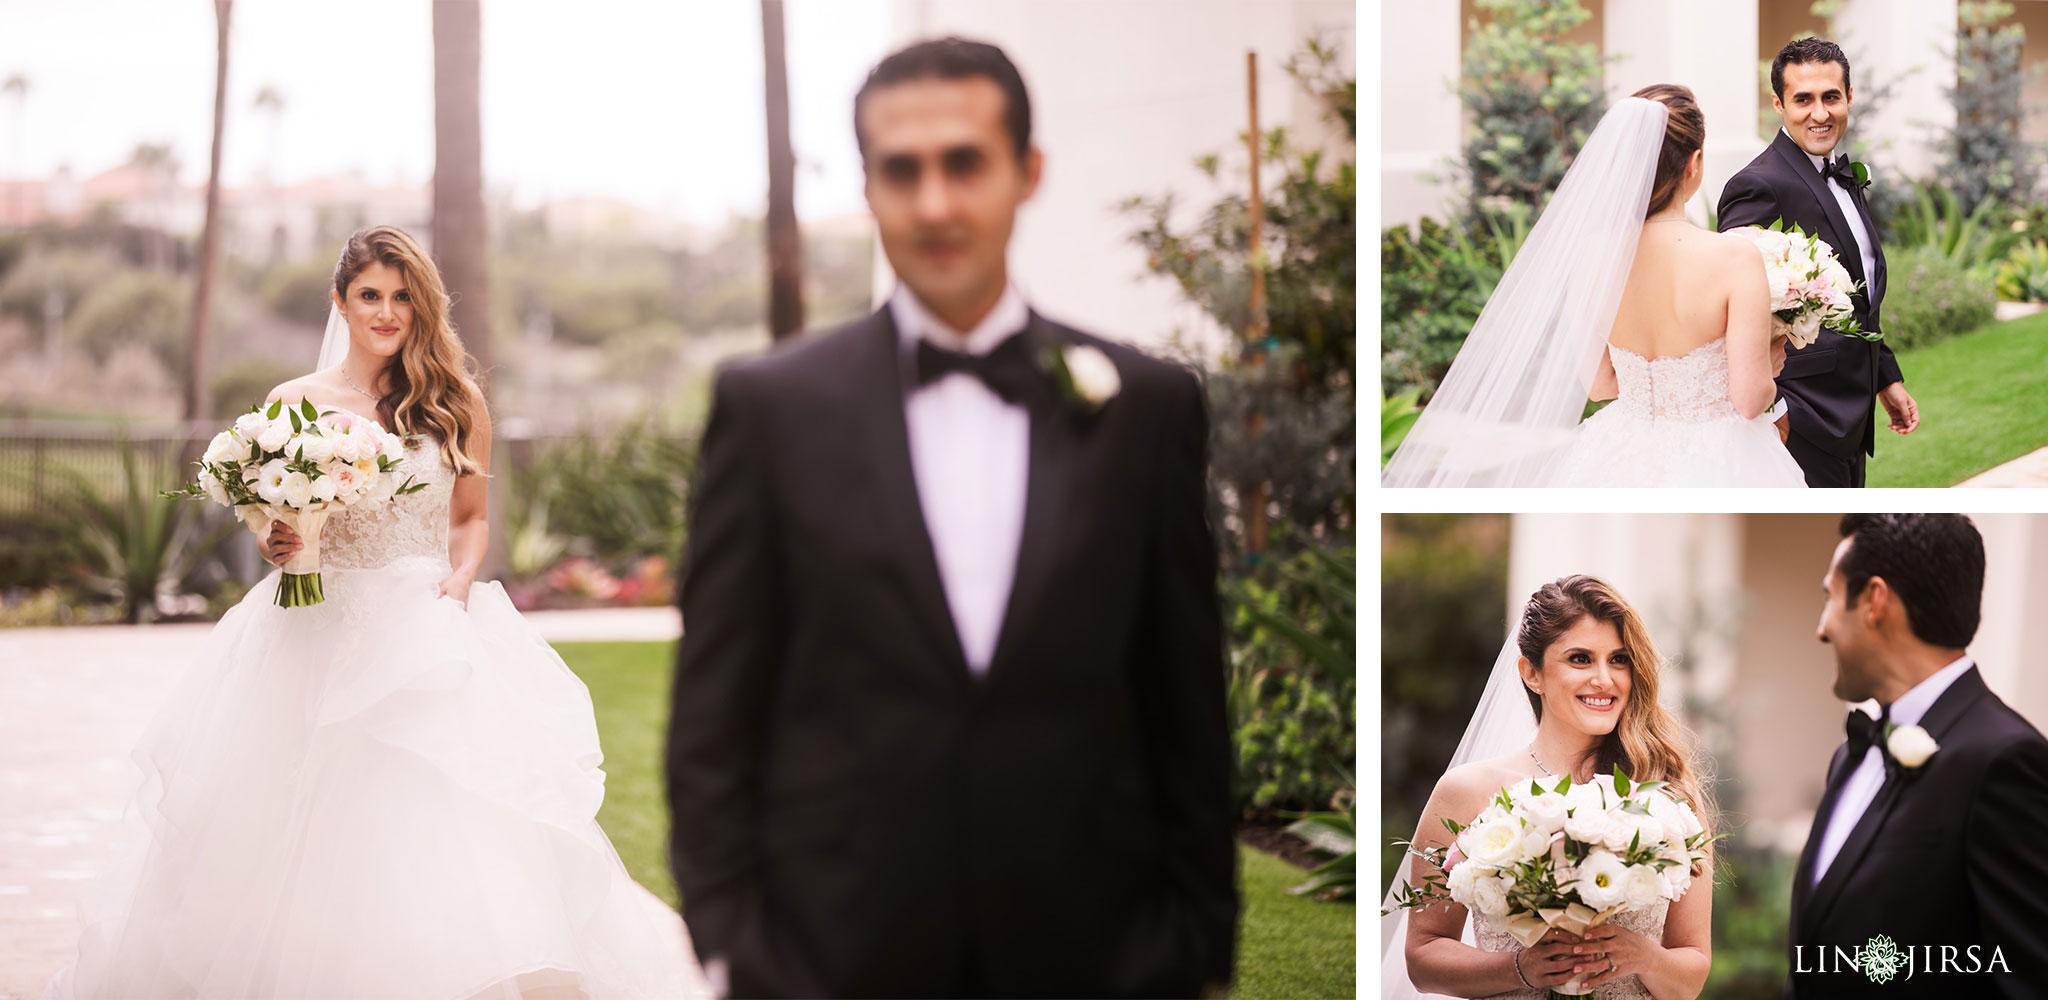 08 monarch beach resort laguna niguel persian wedding photography